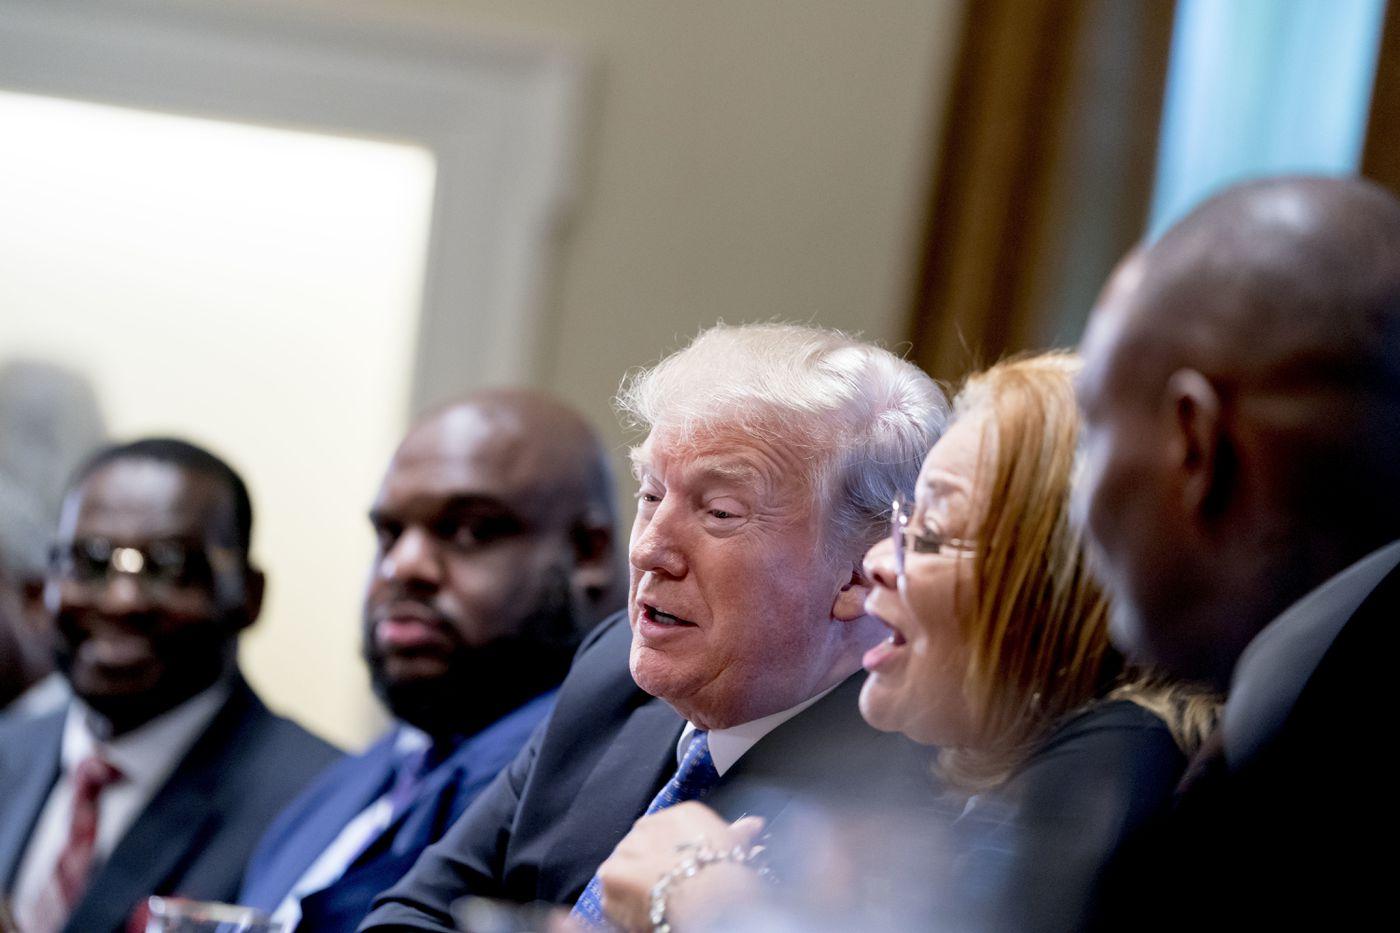 Black pastors betrayed their community by standing with Trump | Solomon Jones